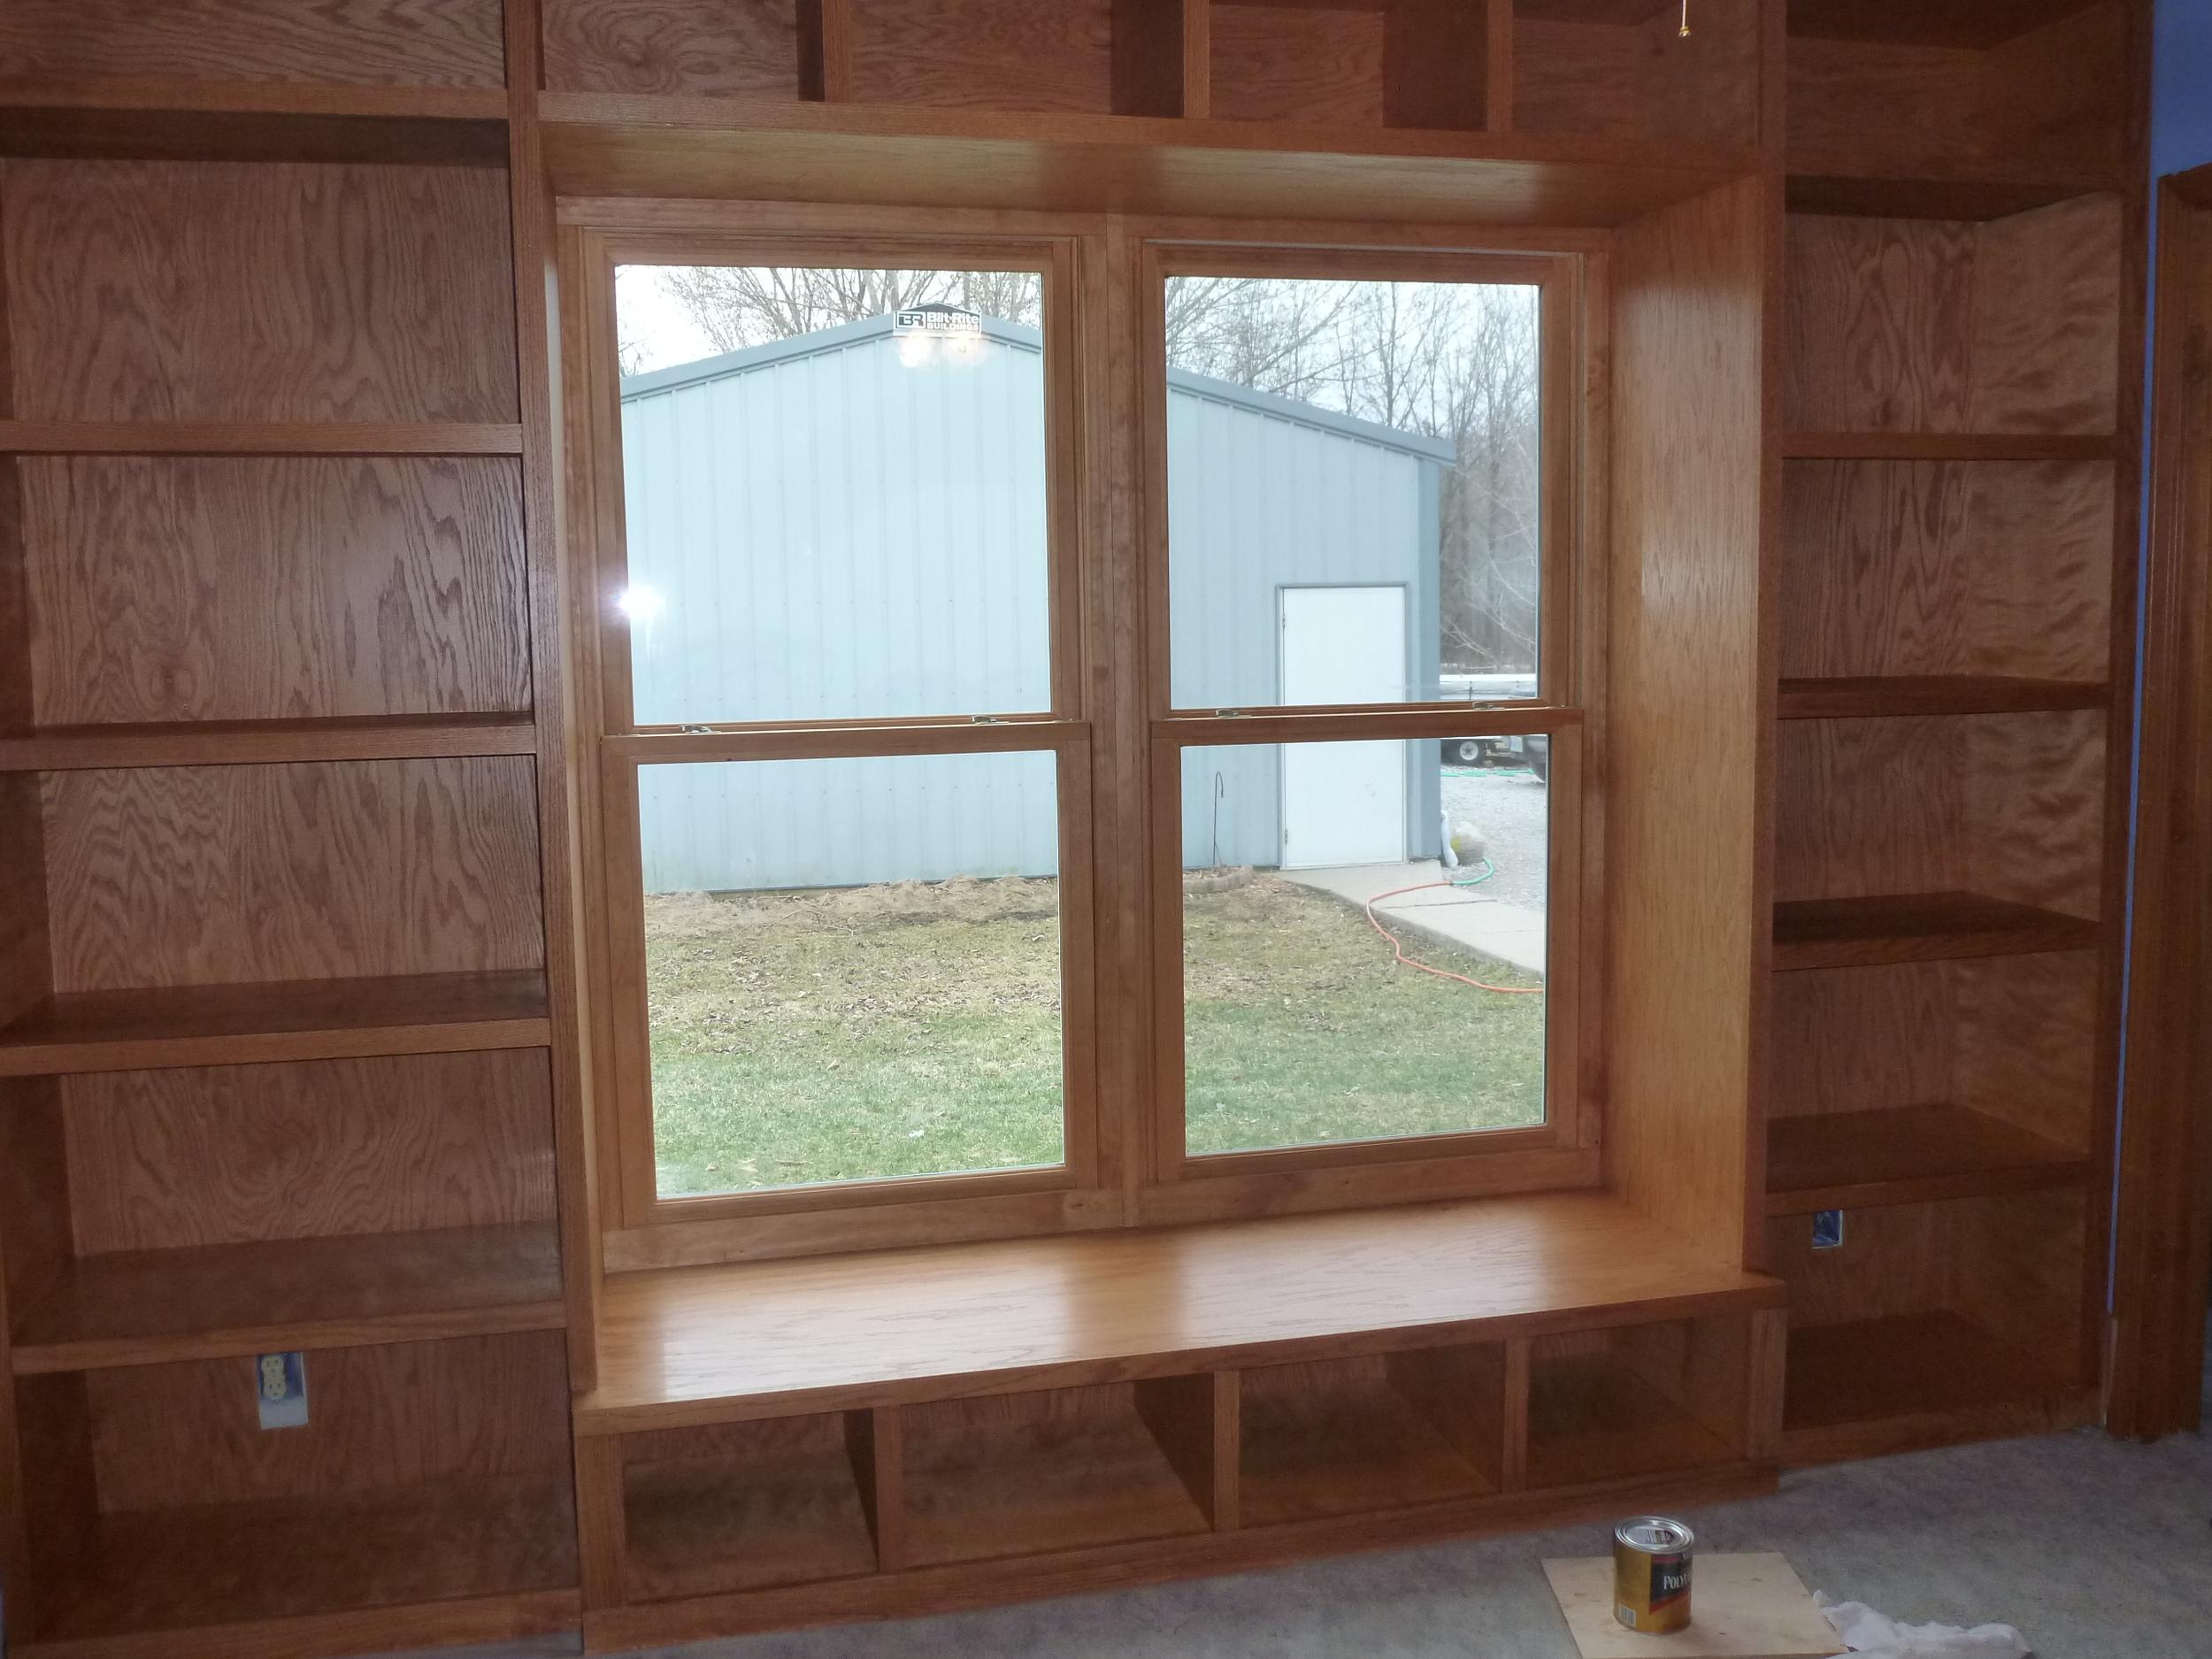 Builtin Window Seat & Shelves